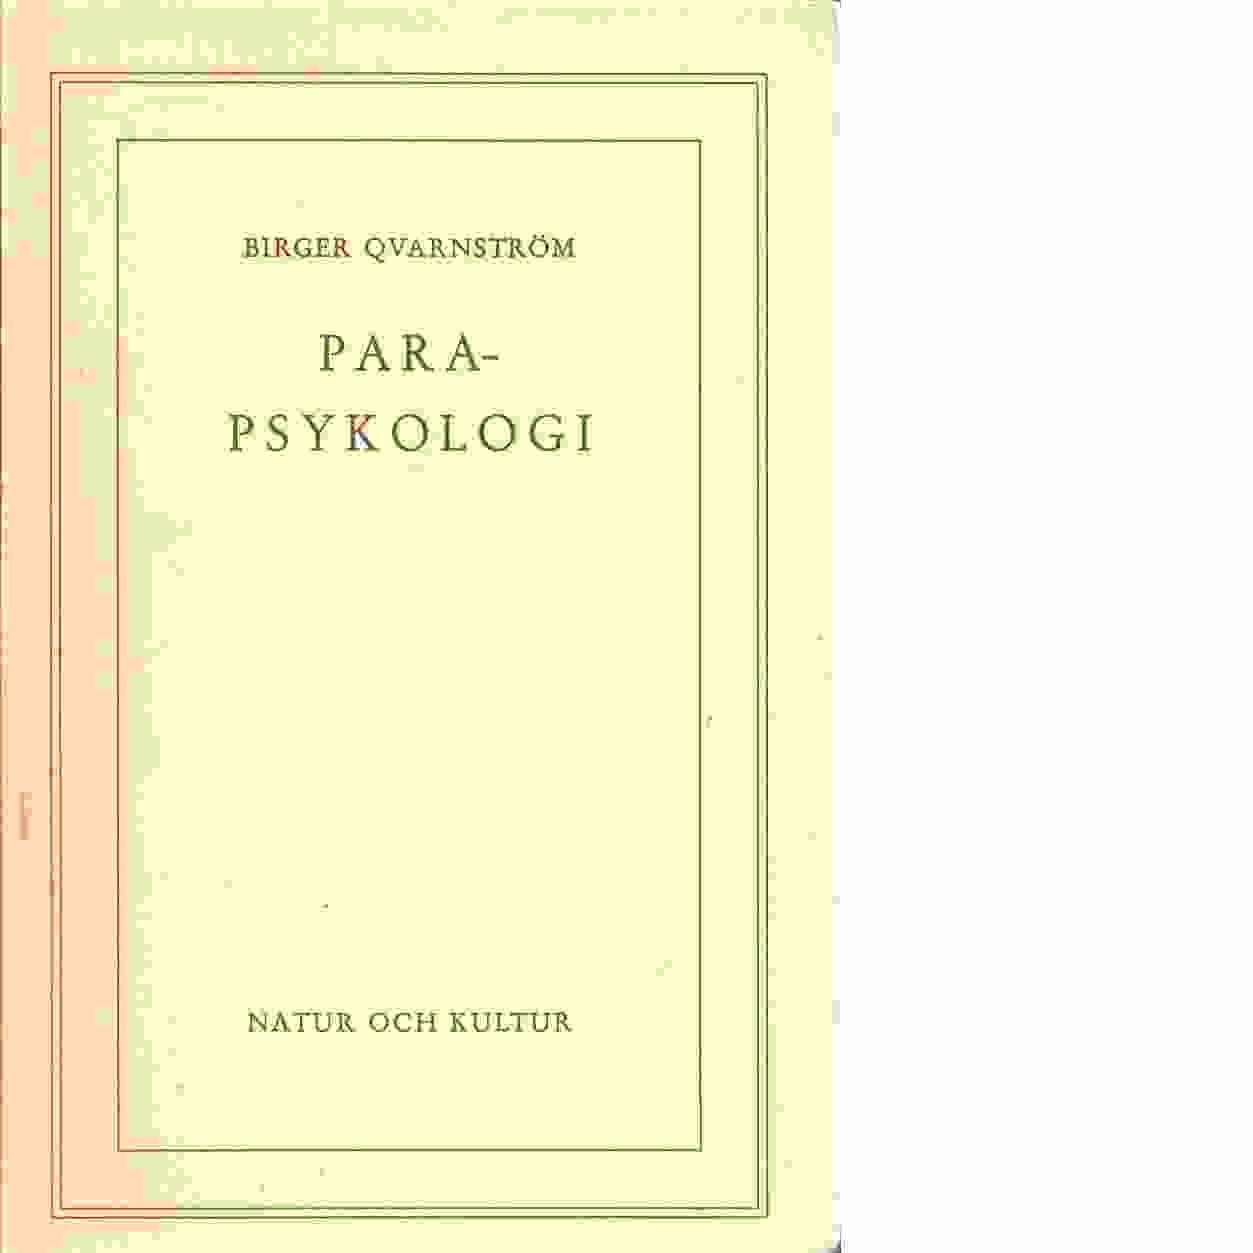 Parapsykologi - Qvarnström, Birger.